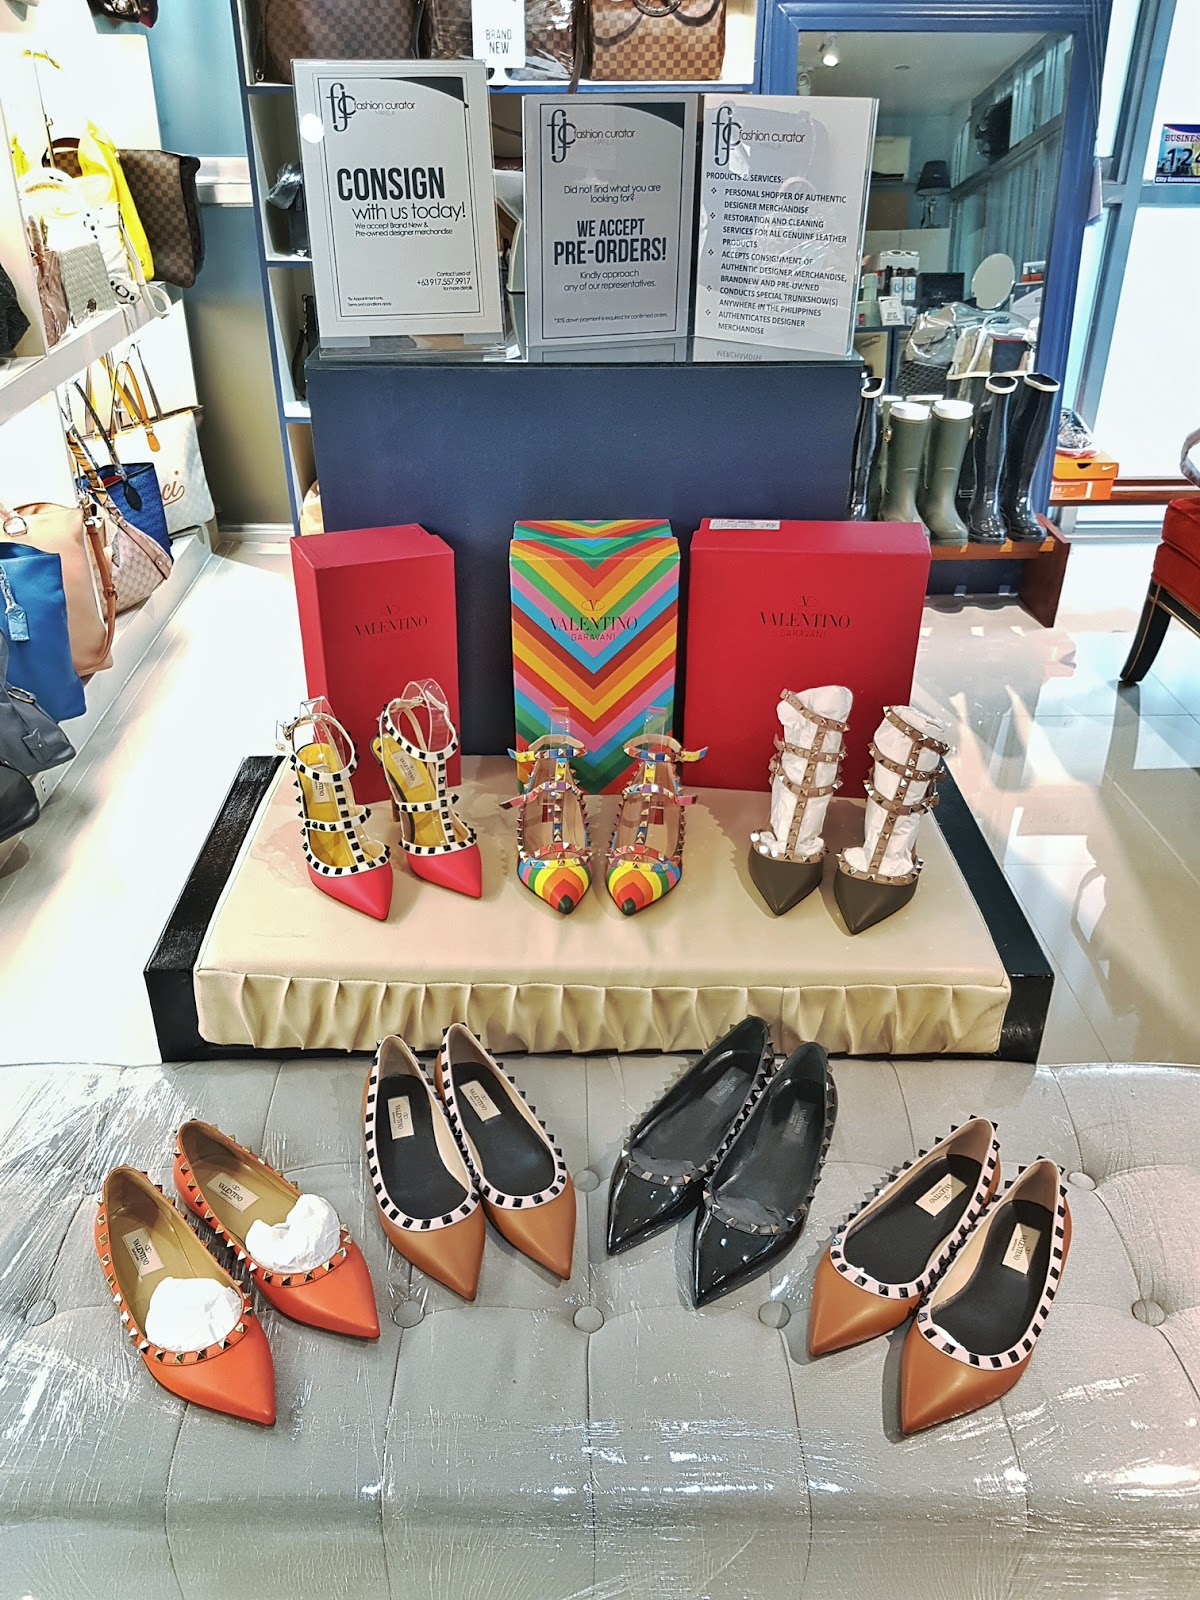 Cebu, Fashion Blogger, Beauty Blogger, Lifestyle, Luxury Items, Cebu Shops, Celine Mini Luggage, Cebu Events, Fashion Curator Manila, branded bags, for sale, Cebu trunk show, pop-up shop, branded preloved bags, Valentino, heels, shoes, spiked shoes